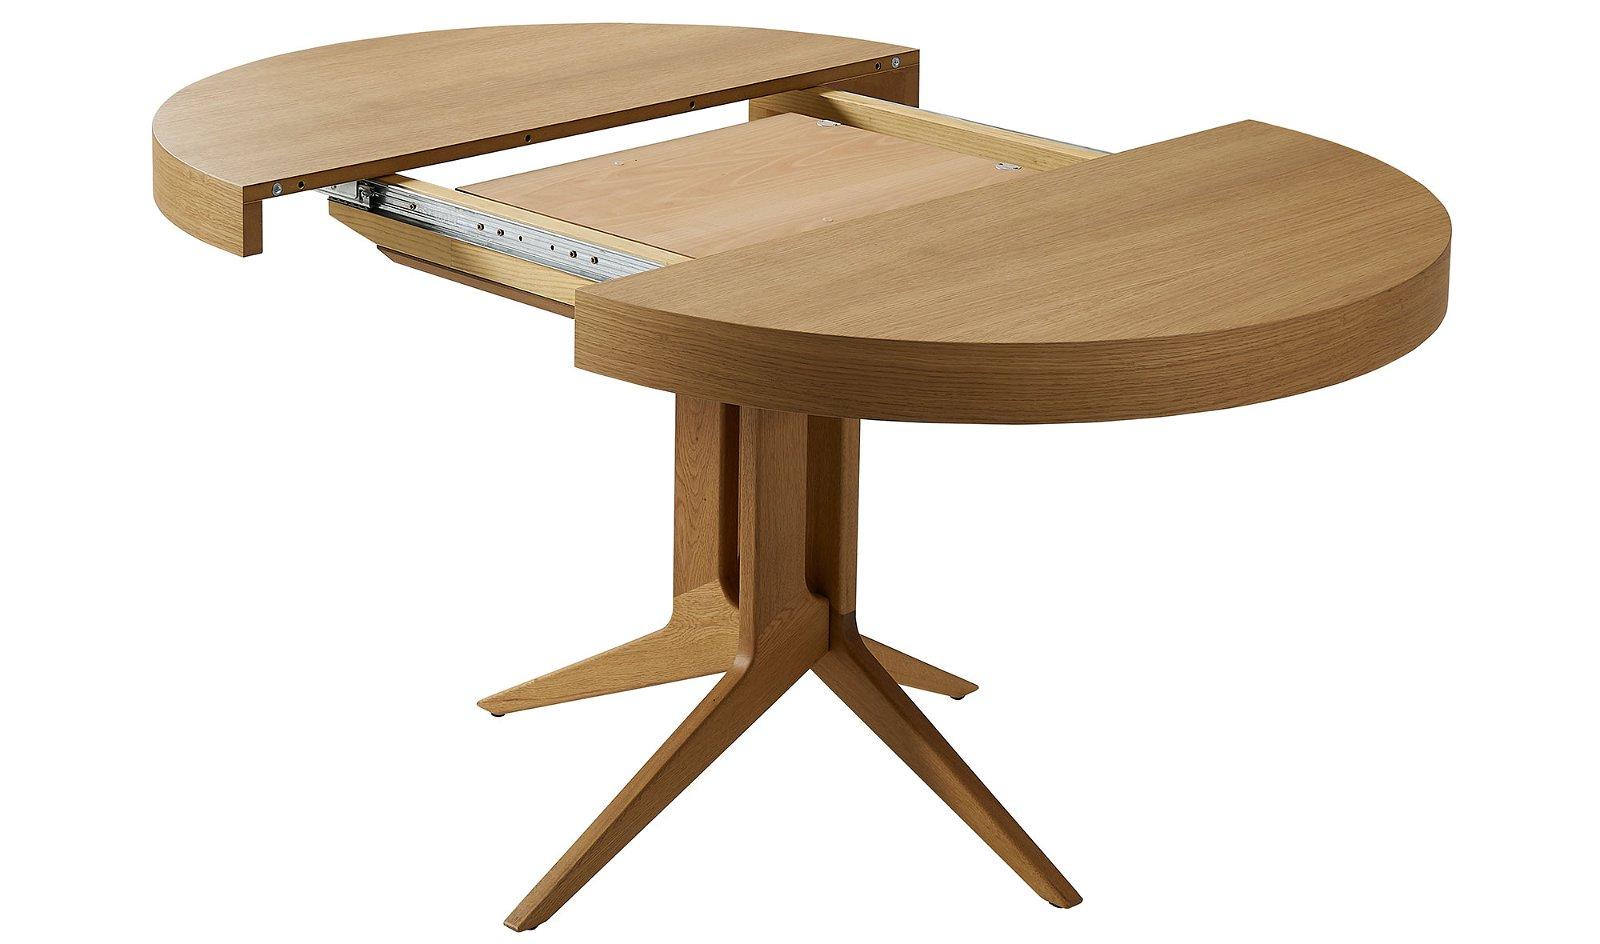 Mesa de comedor redonda extensible roble Dreslon